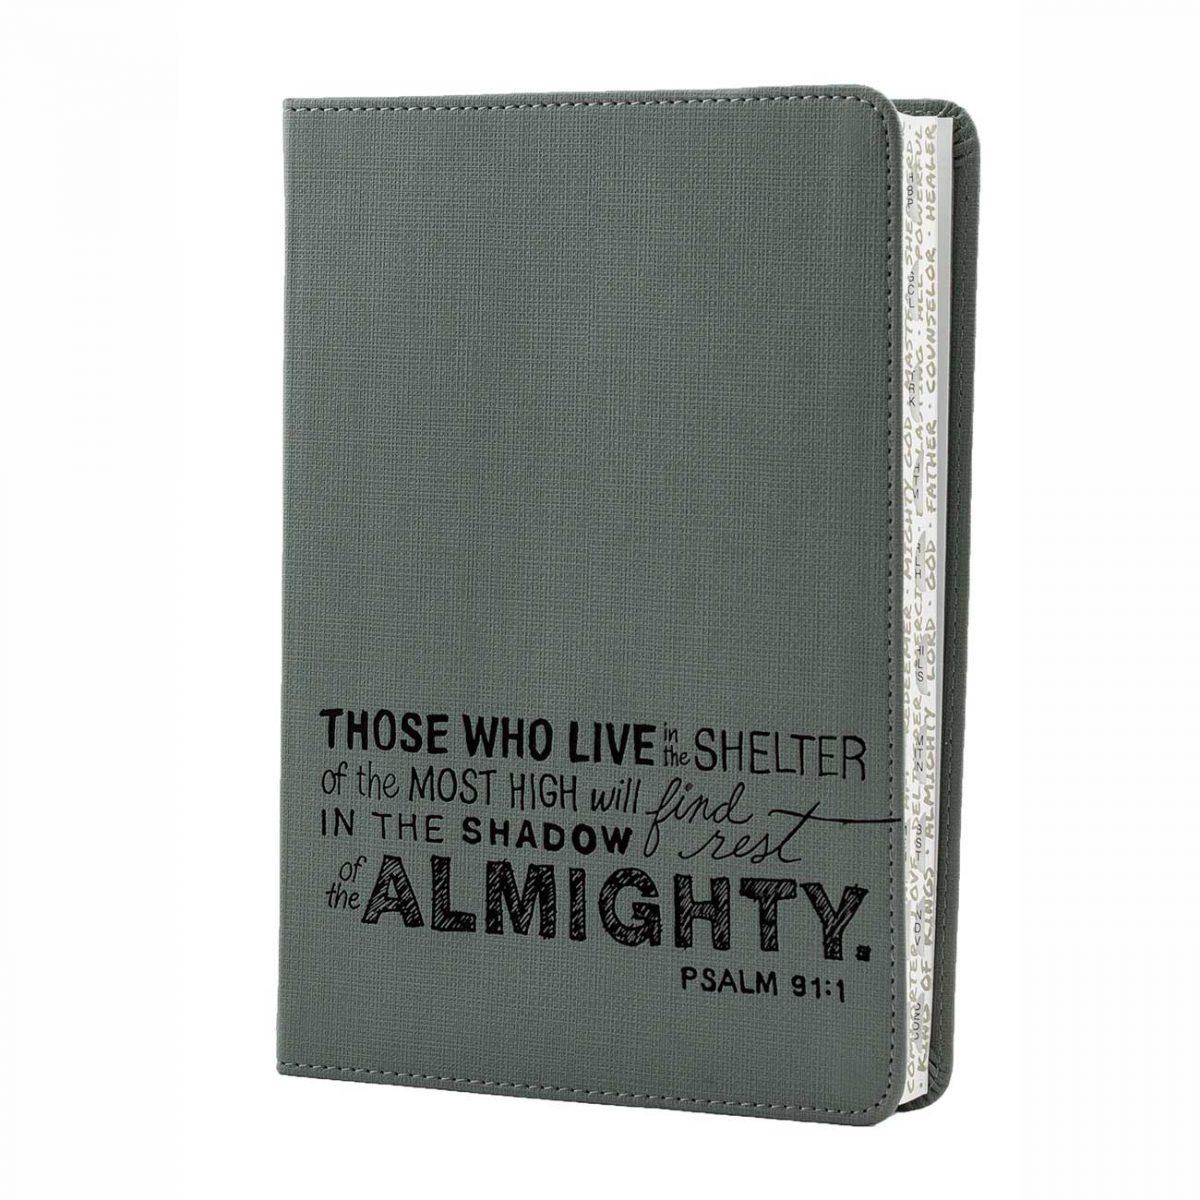 Teen Slimline Bible, NLT version